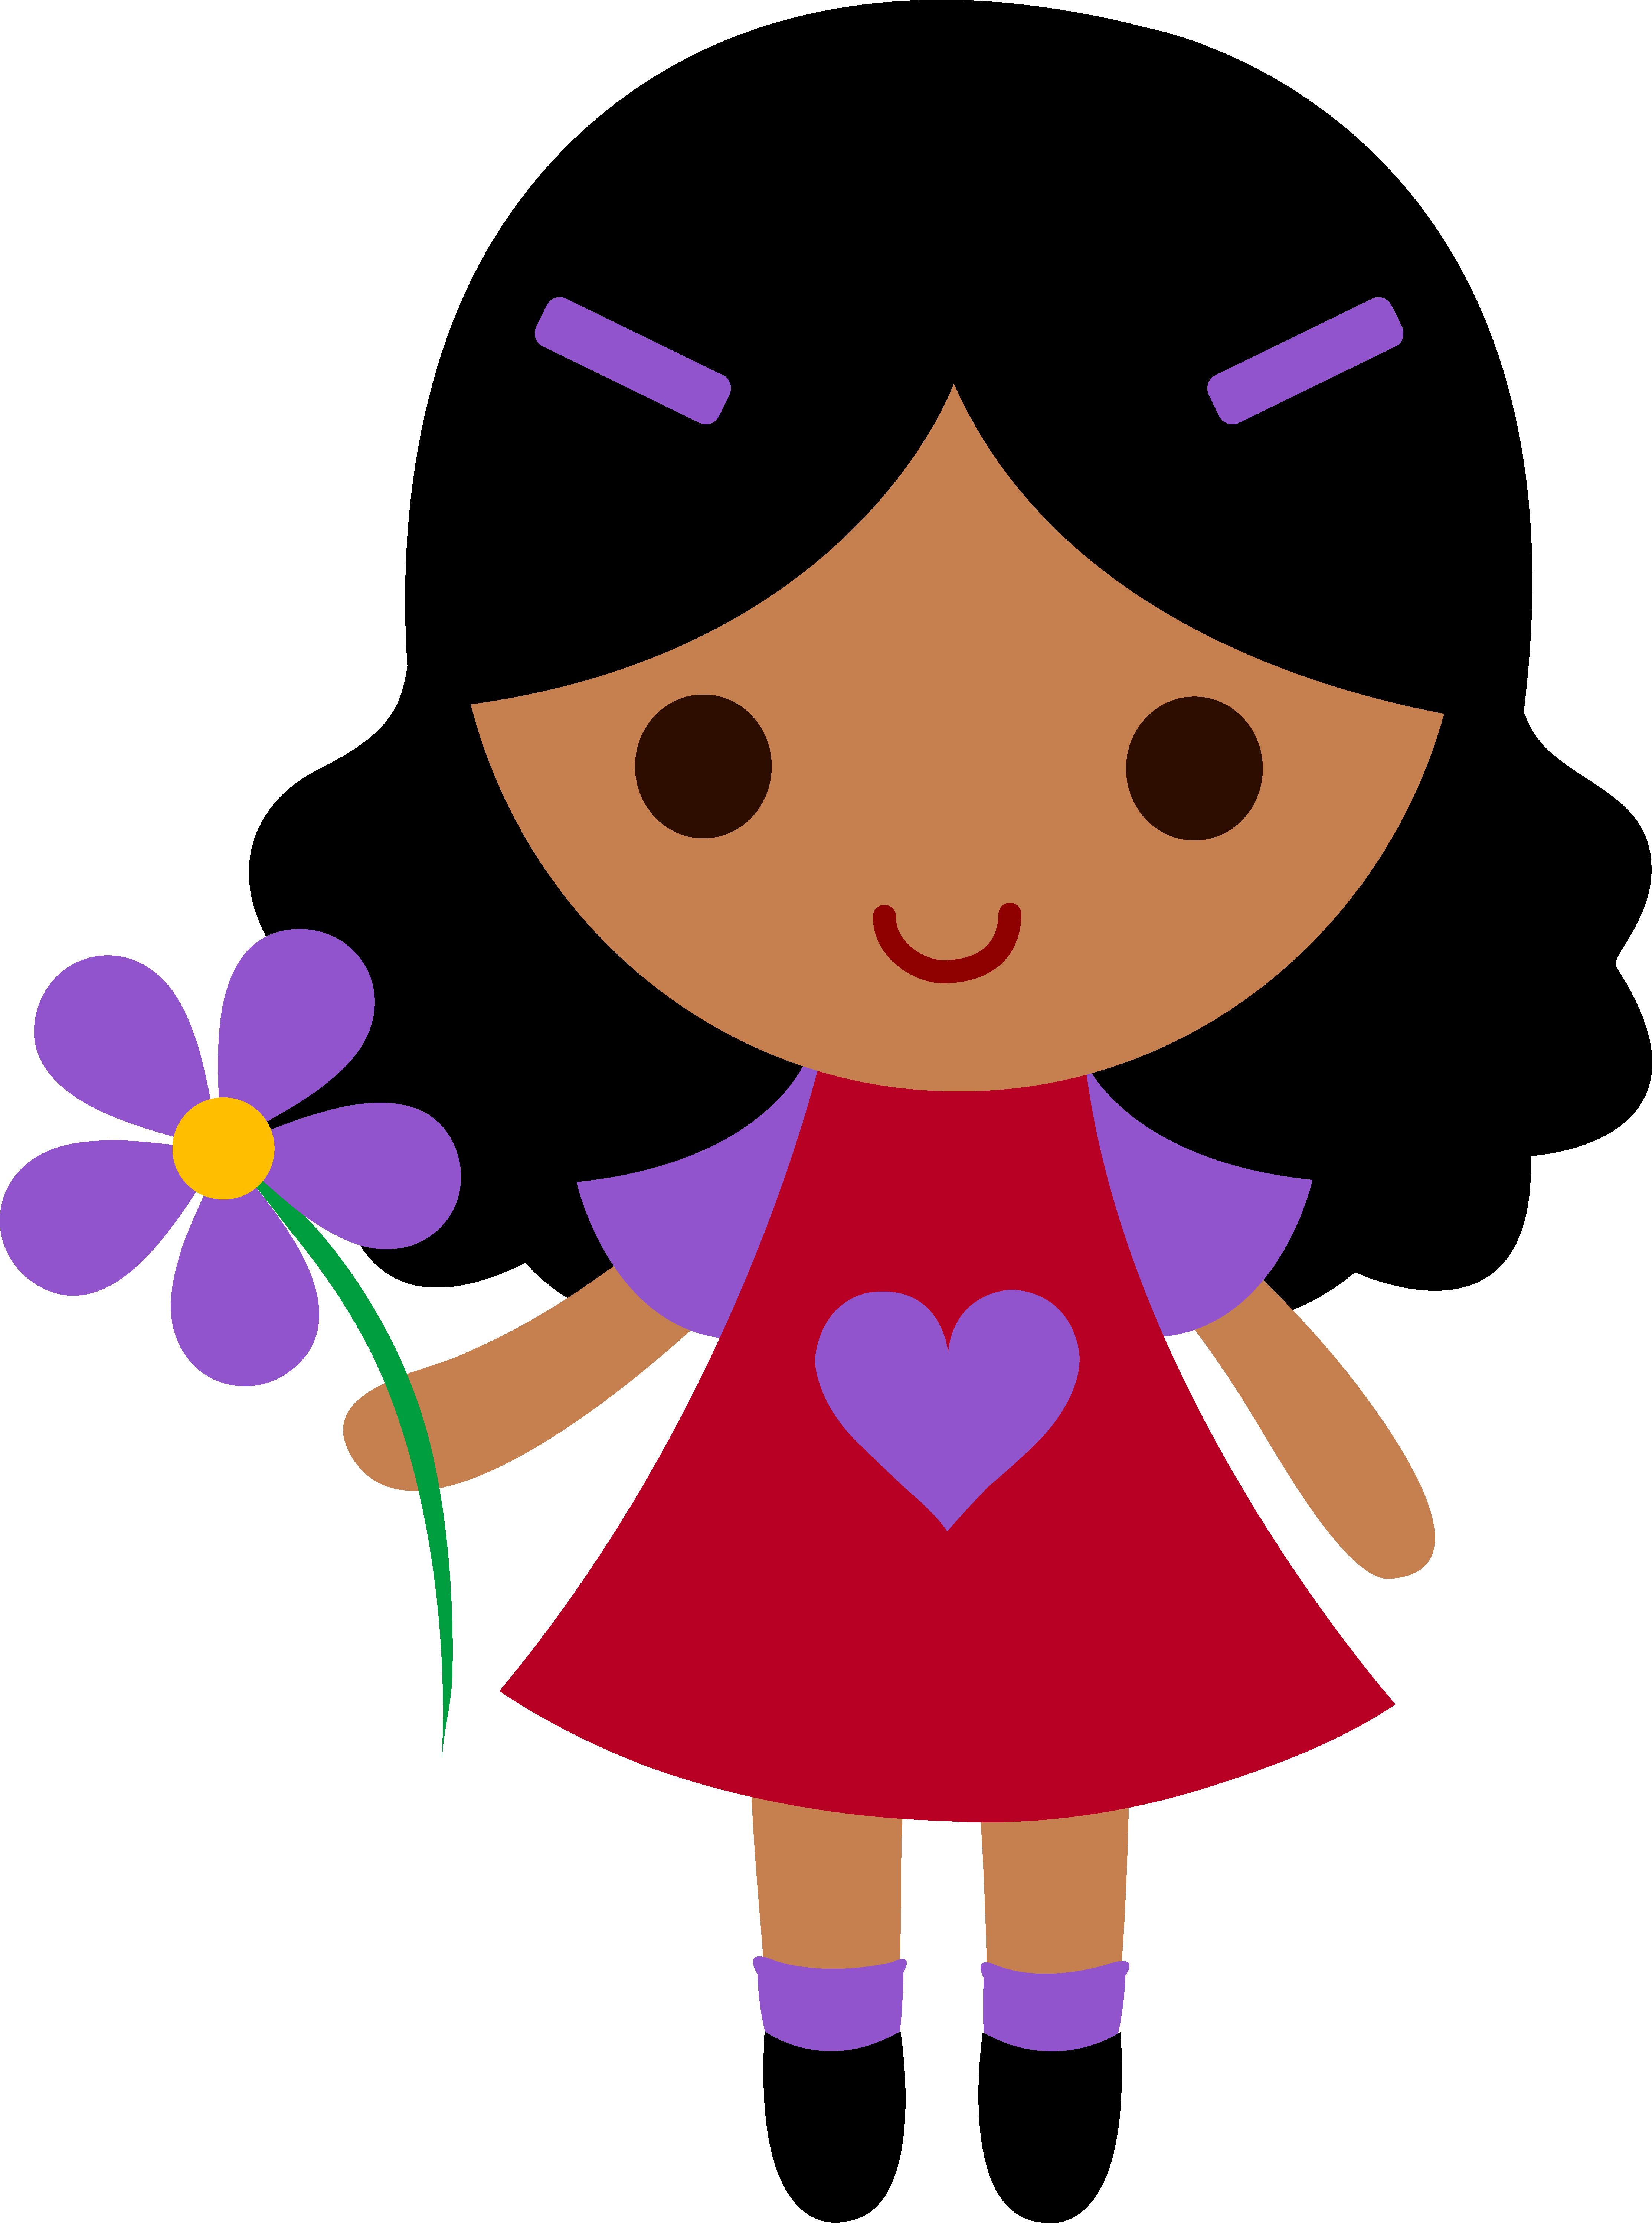 my clip art of a little girl holding a purple flower [ 4451 x 5988 Pixel ]